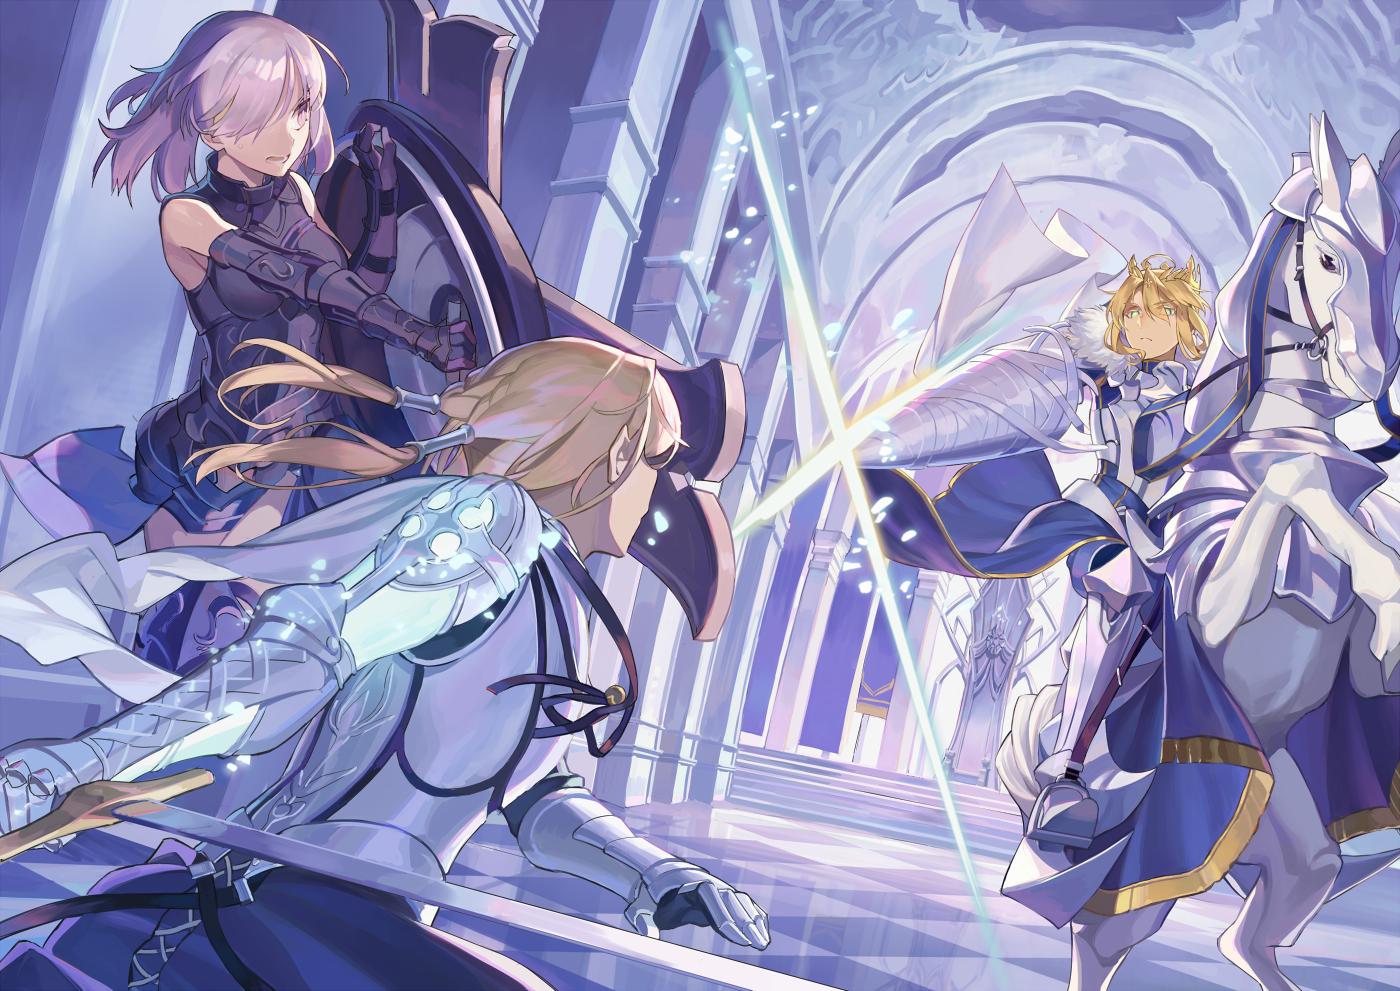 Camelot Showdown Anime, Fate stay night